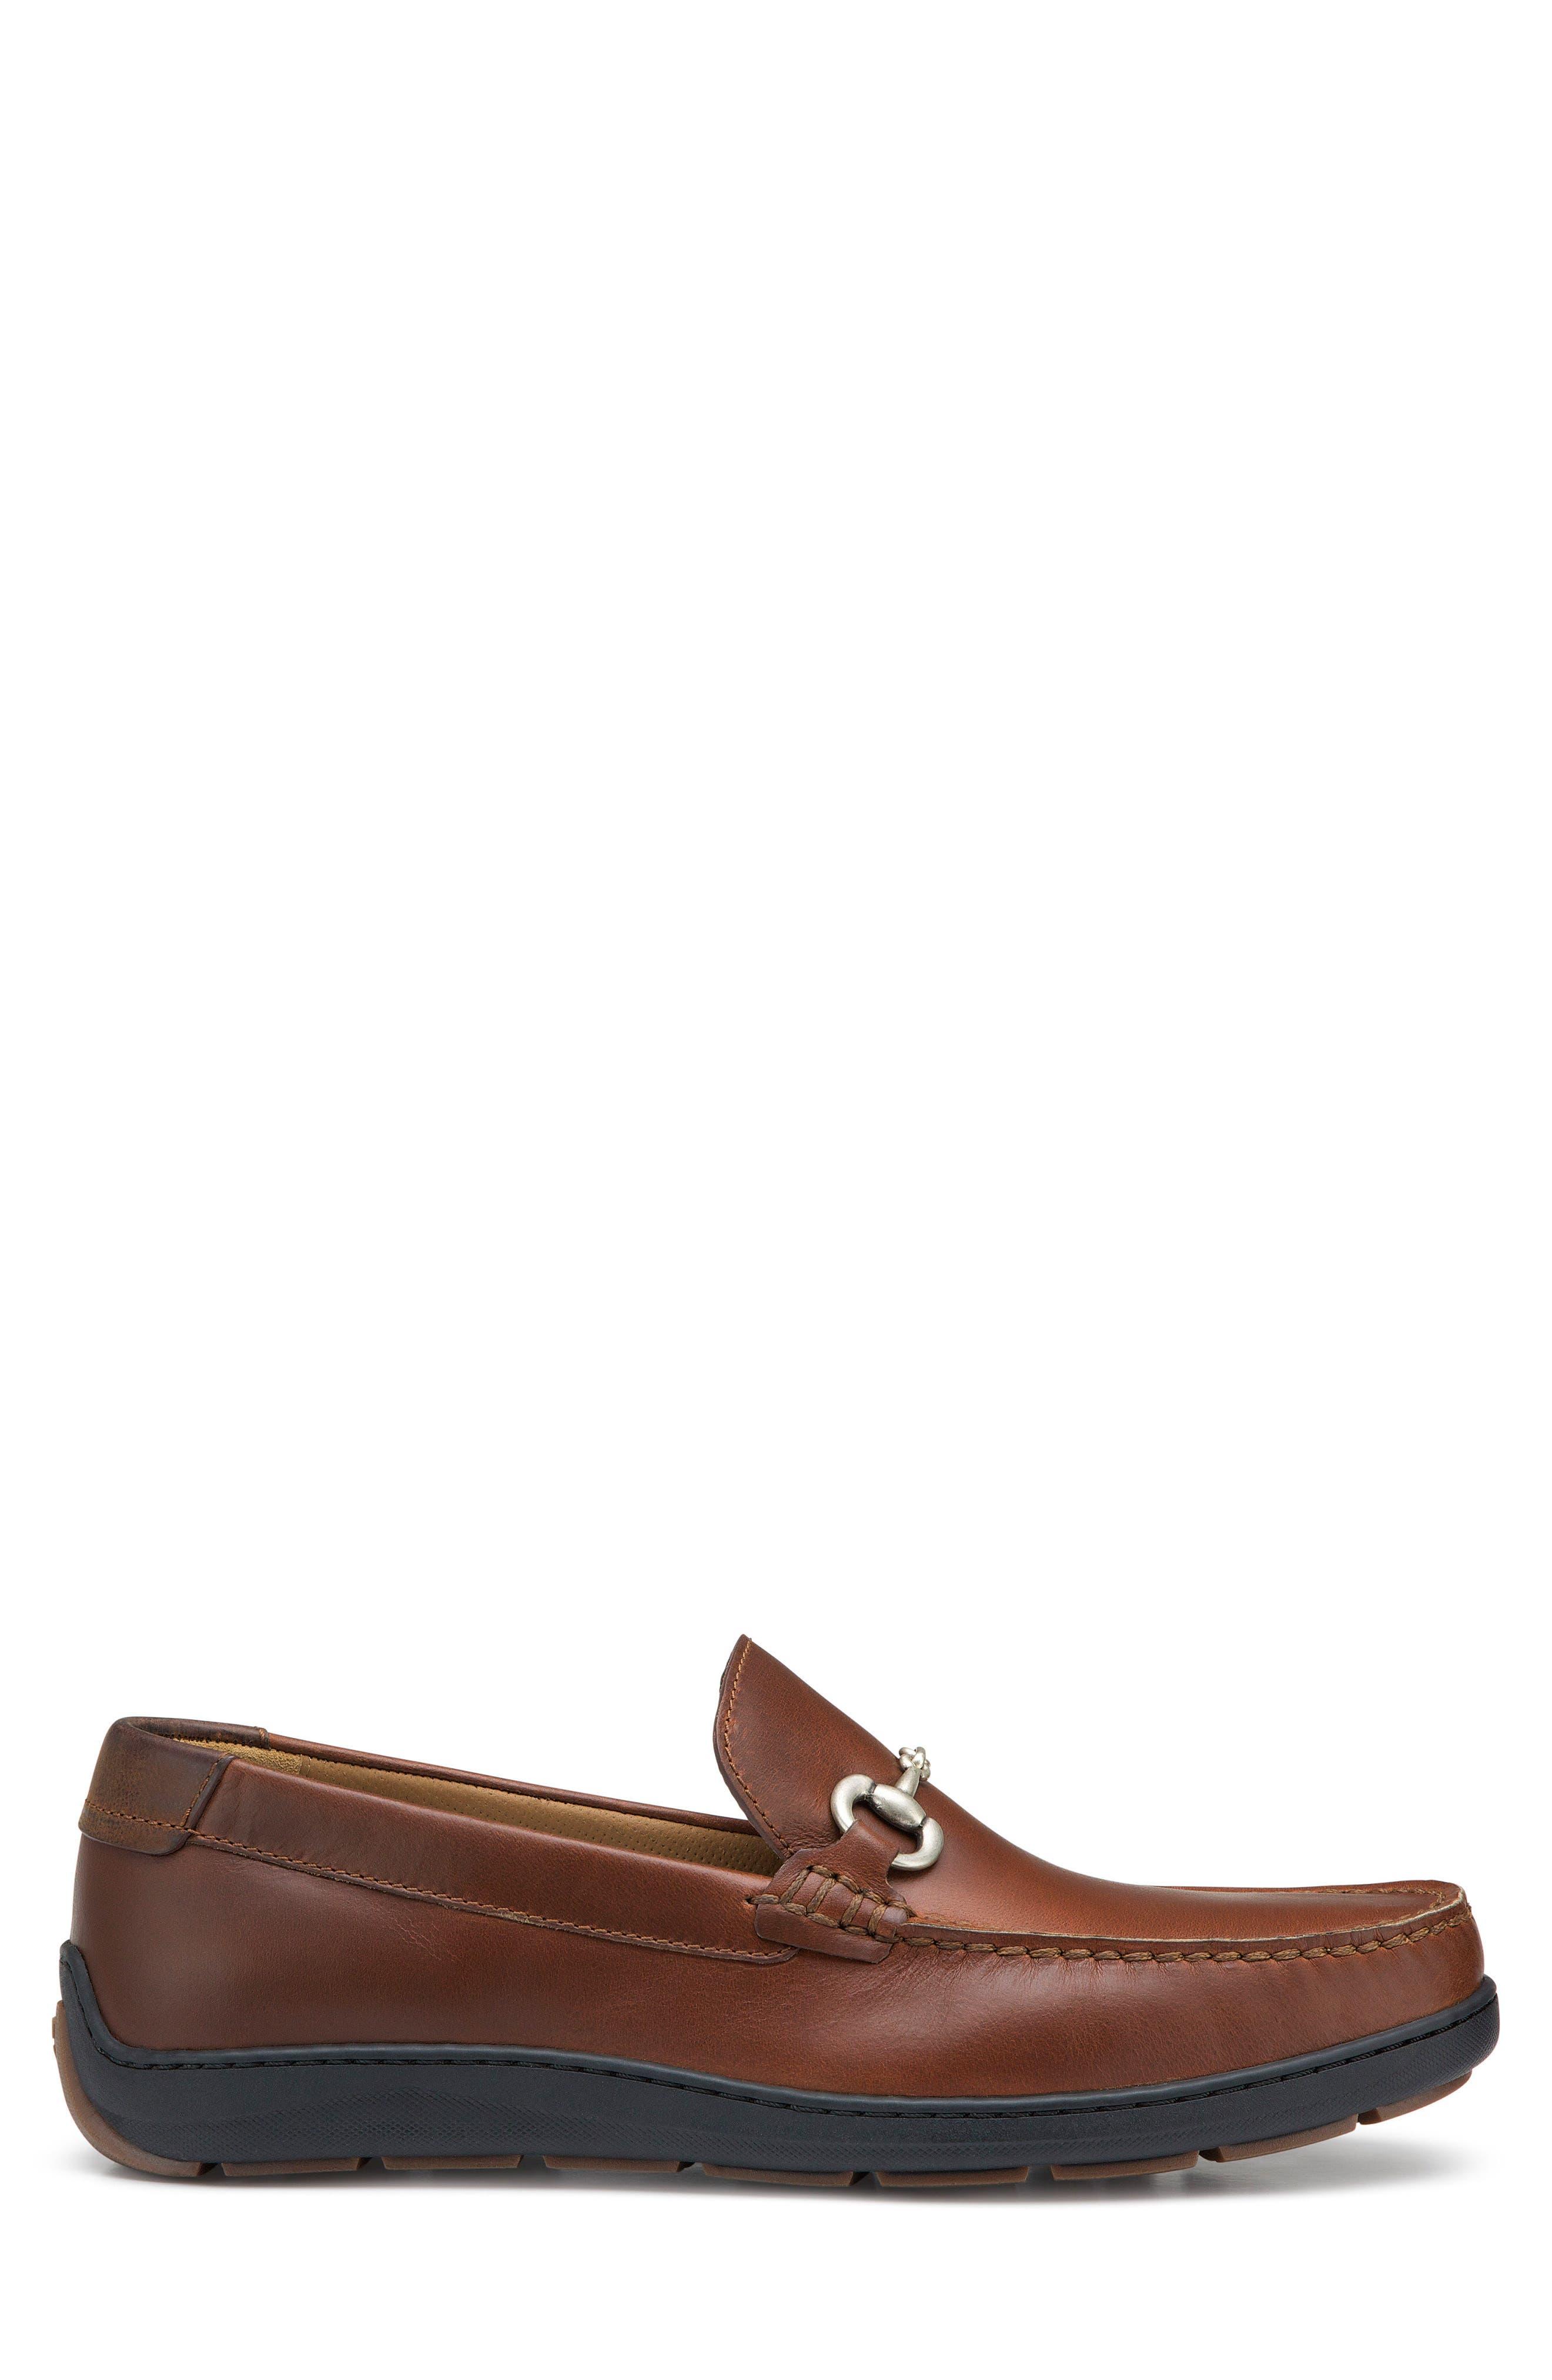 Stalworth Bit Loafer,                             Alternate thumbnail 3, color,                             Brandy Leather